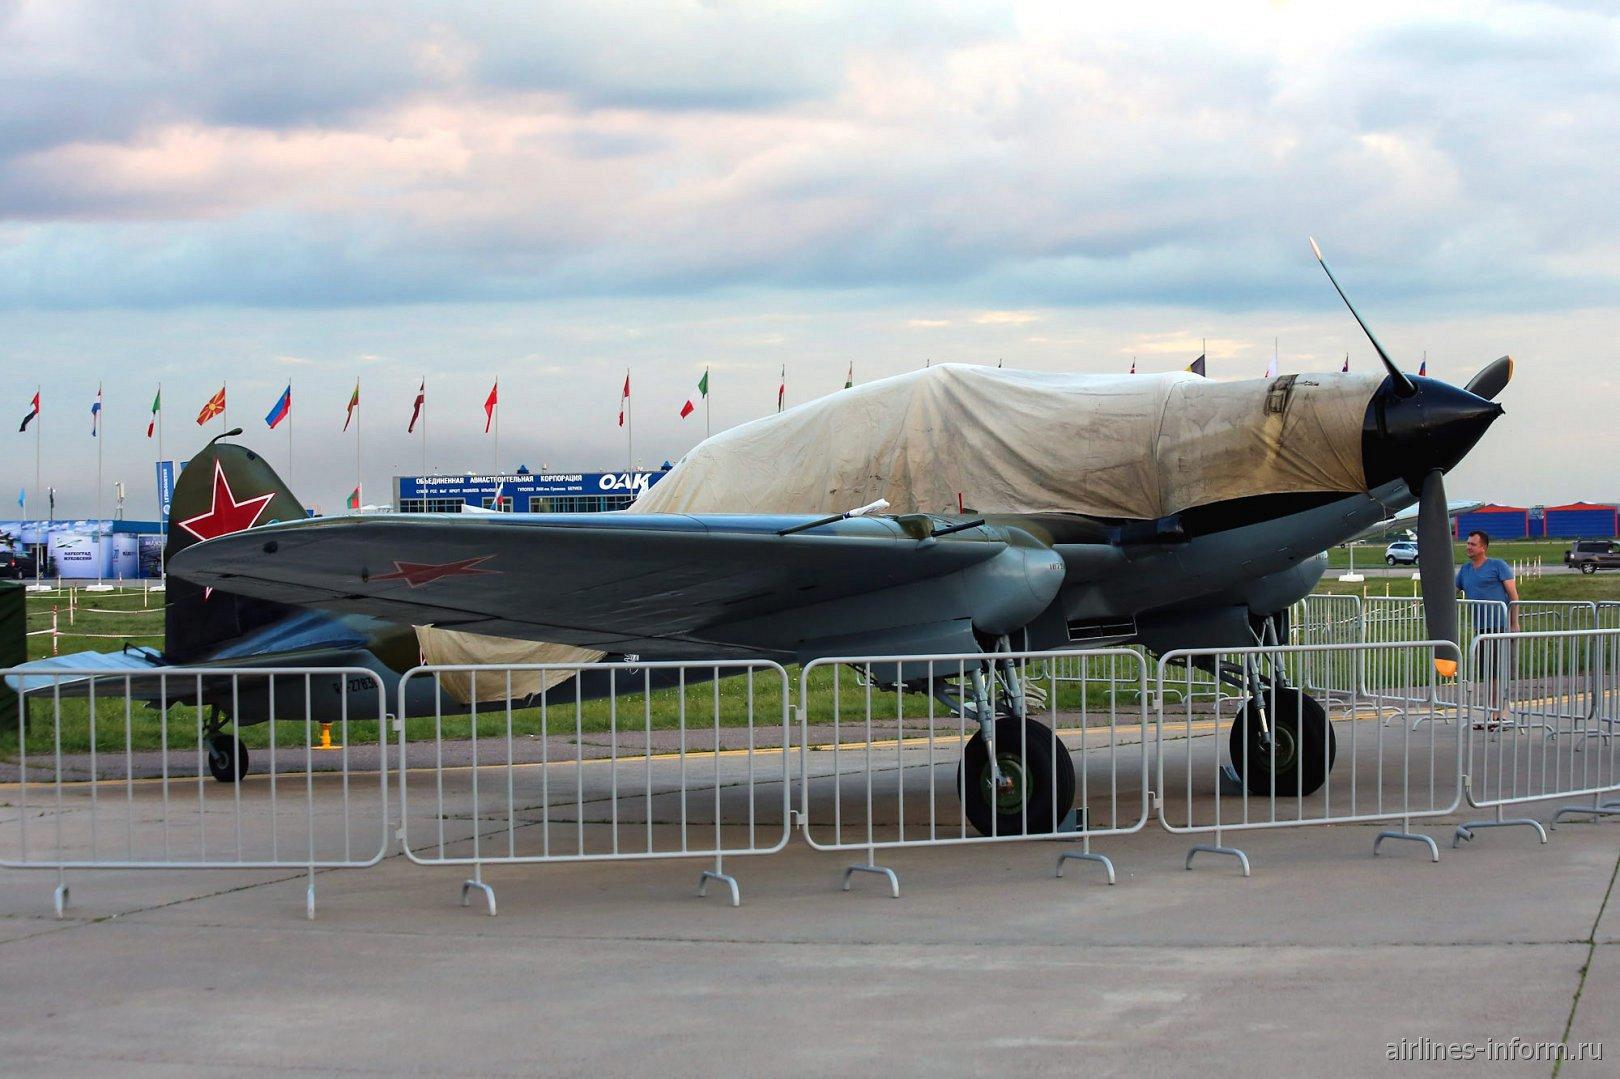 Самолет Ил-2 на авиасалоне МАКС-2017